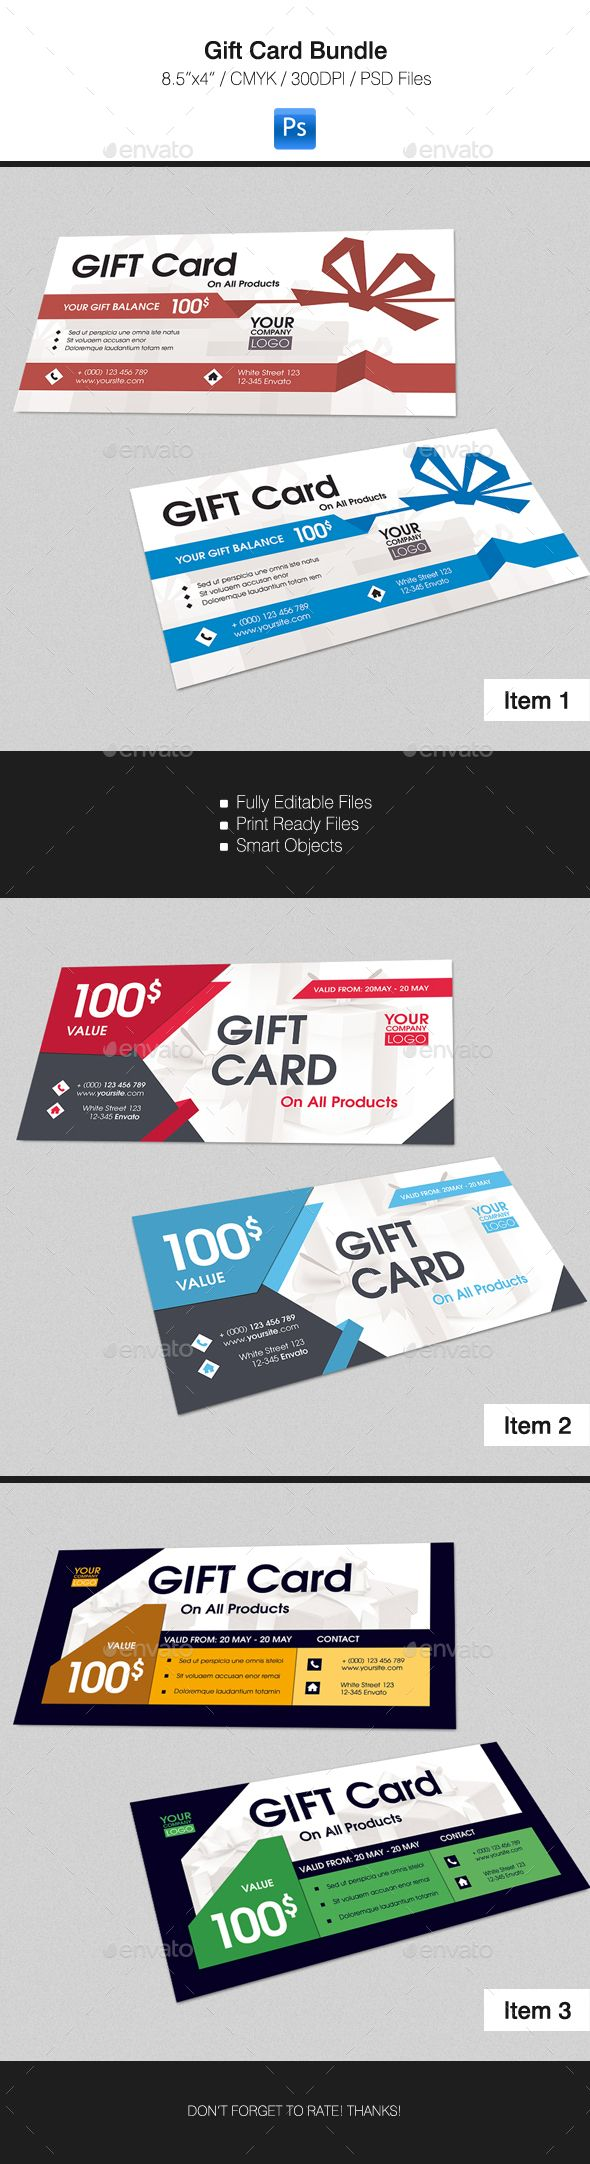 Gift Card #design Download: http://graphicriver.net/item/gift-card-bundle/16391573